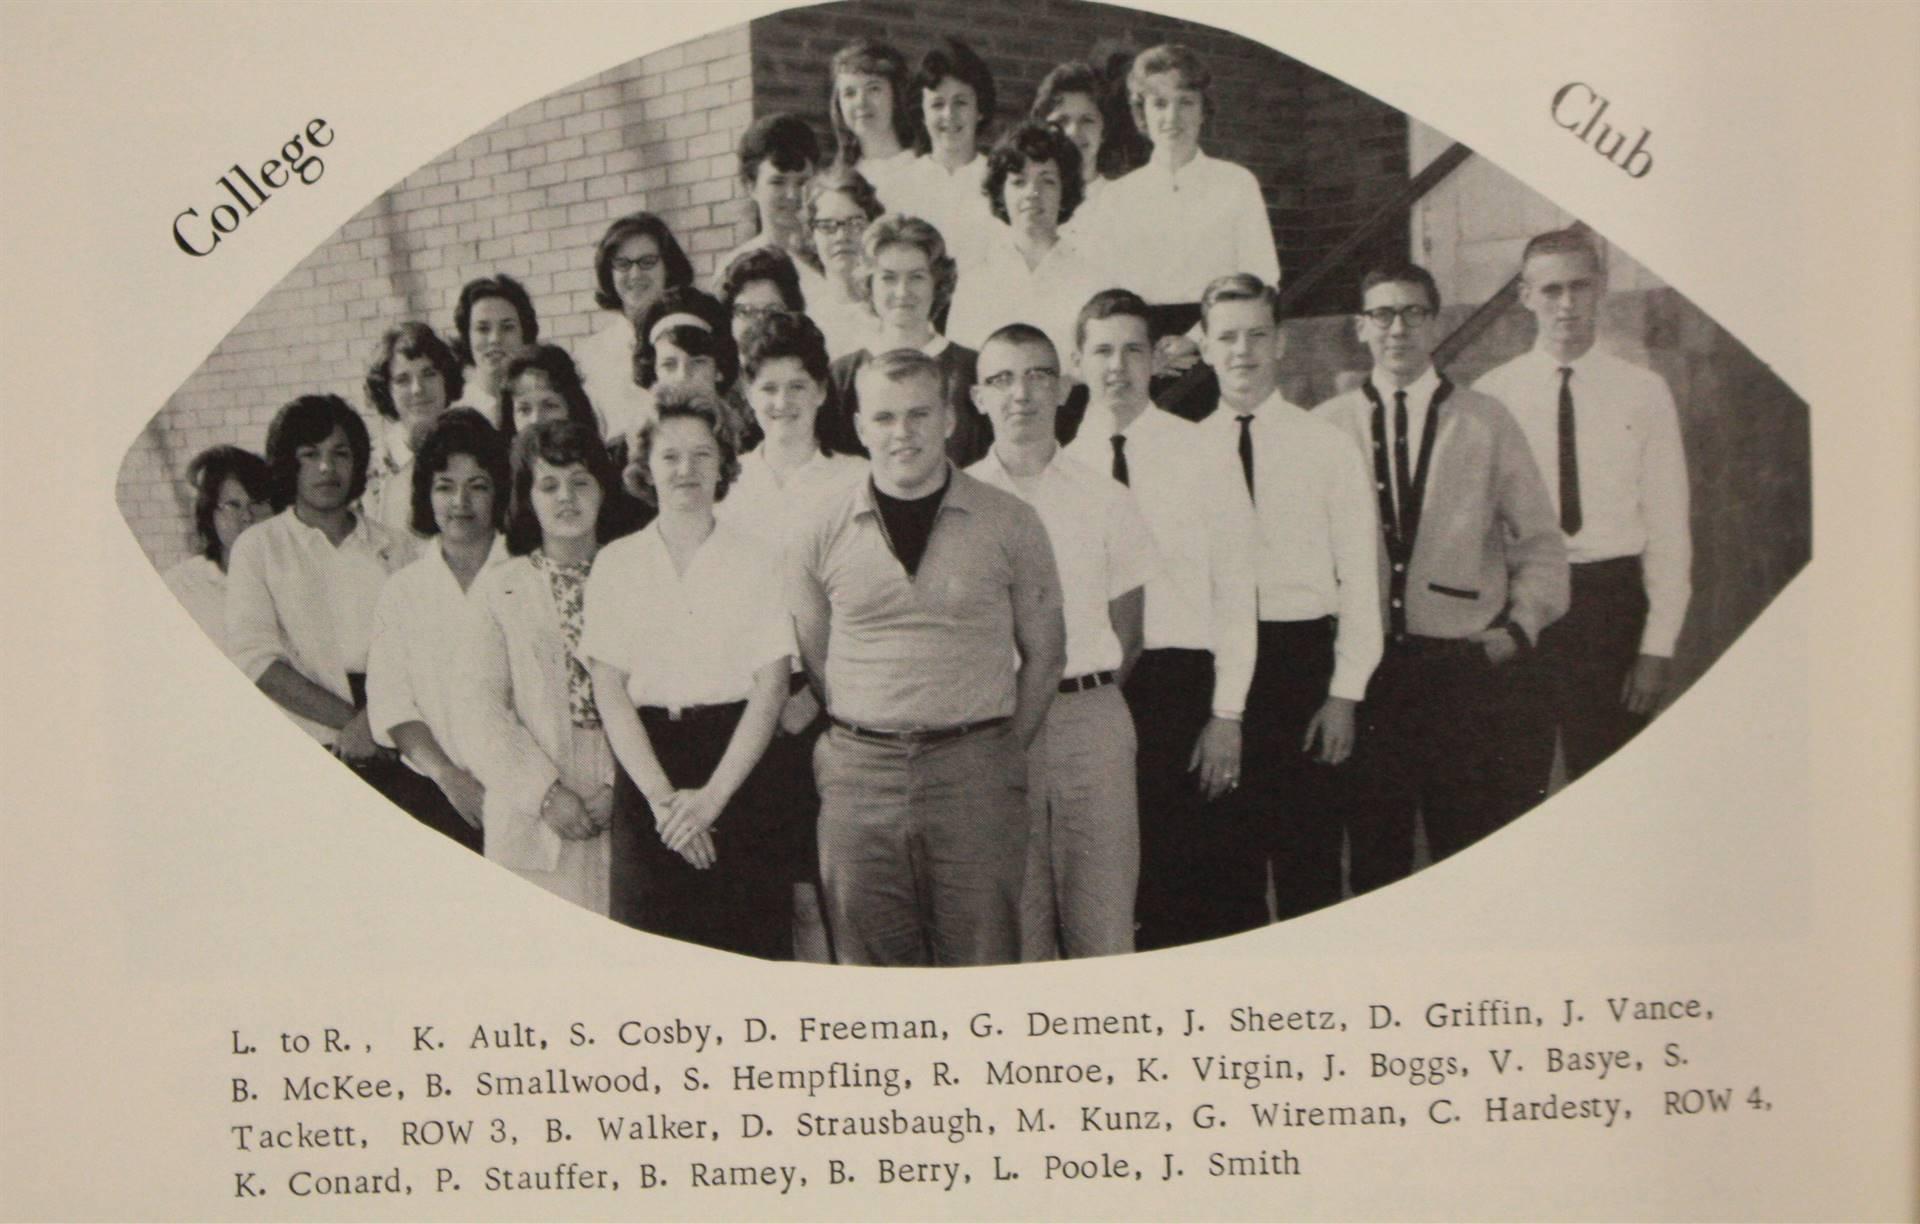 1965 college club